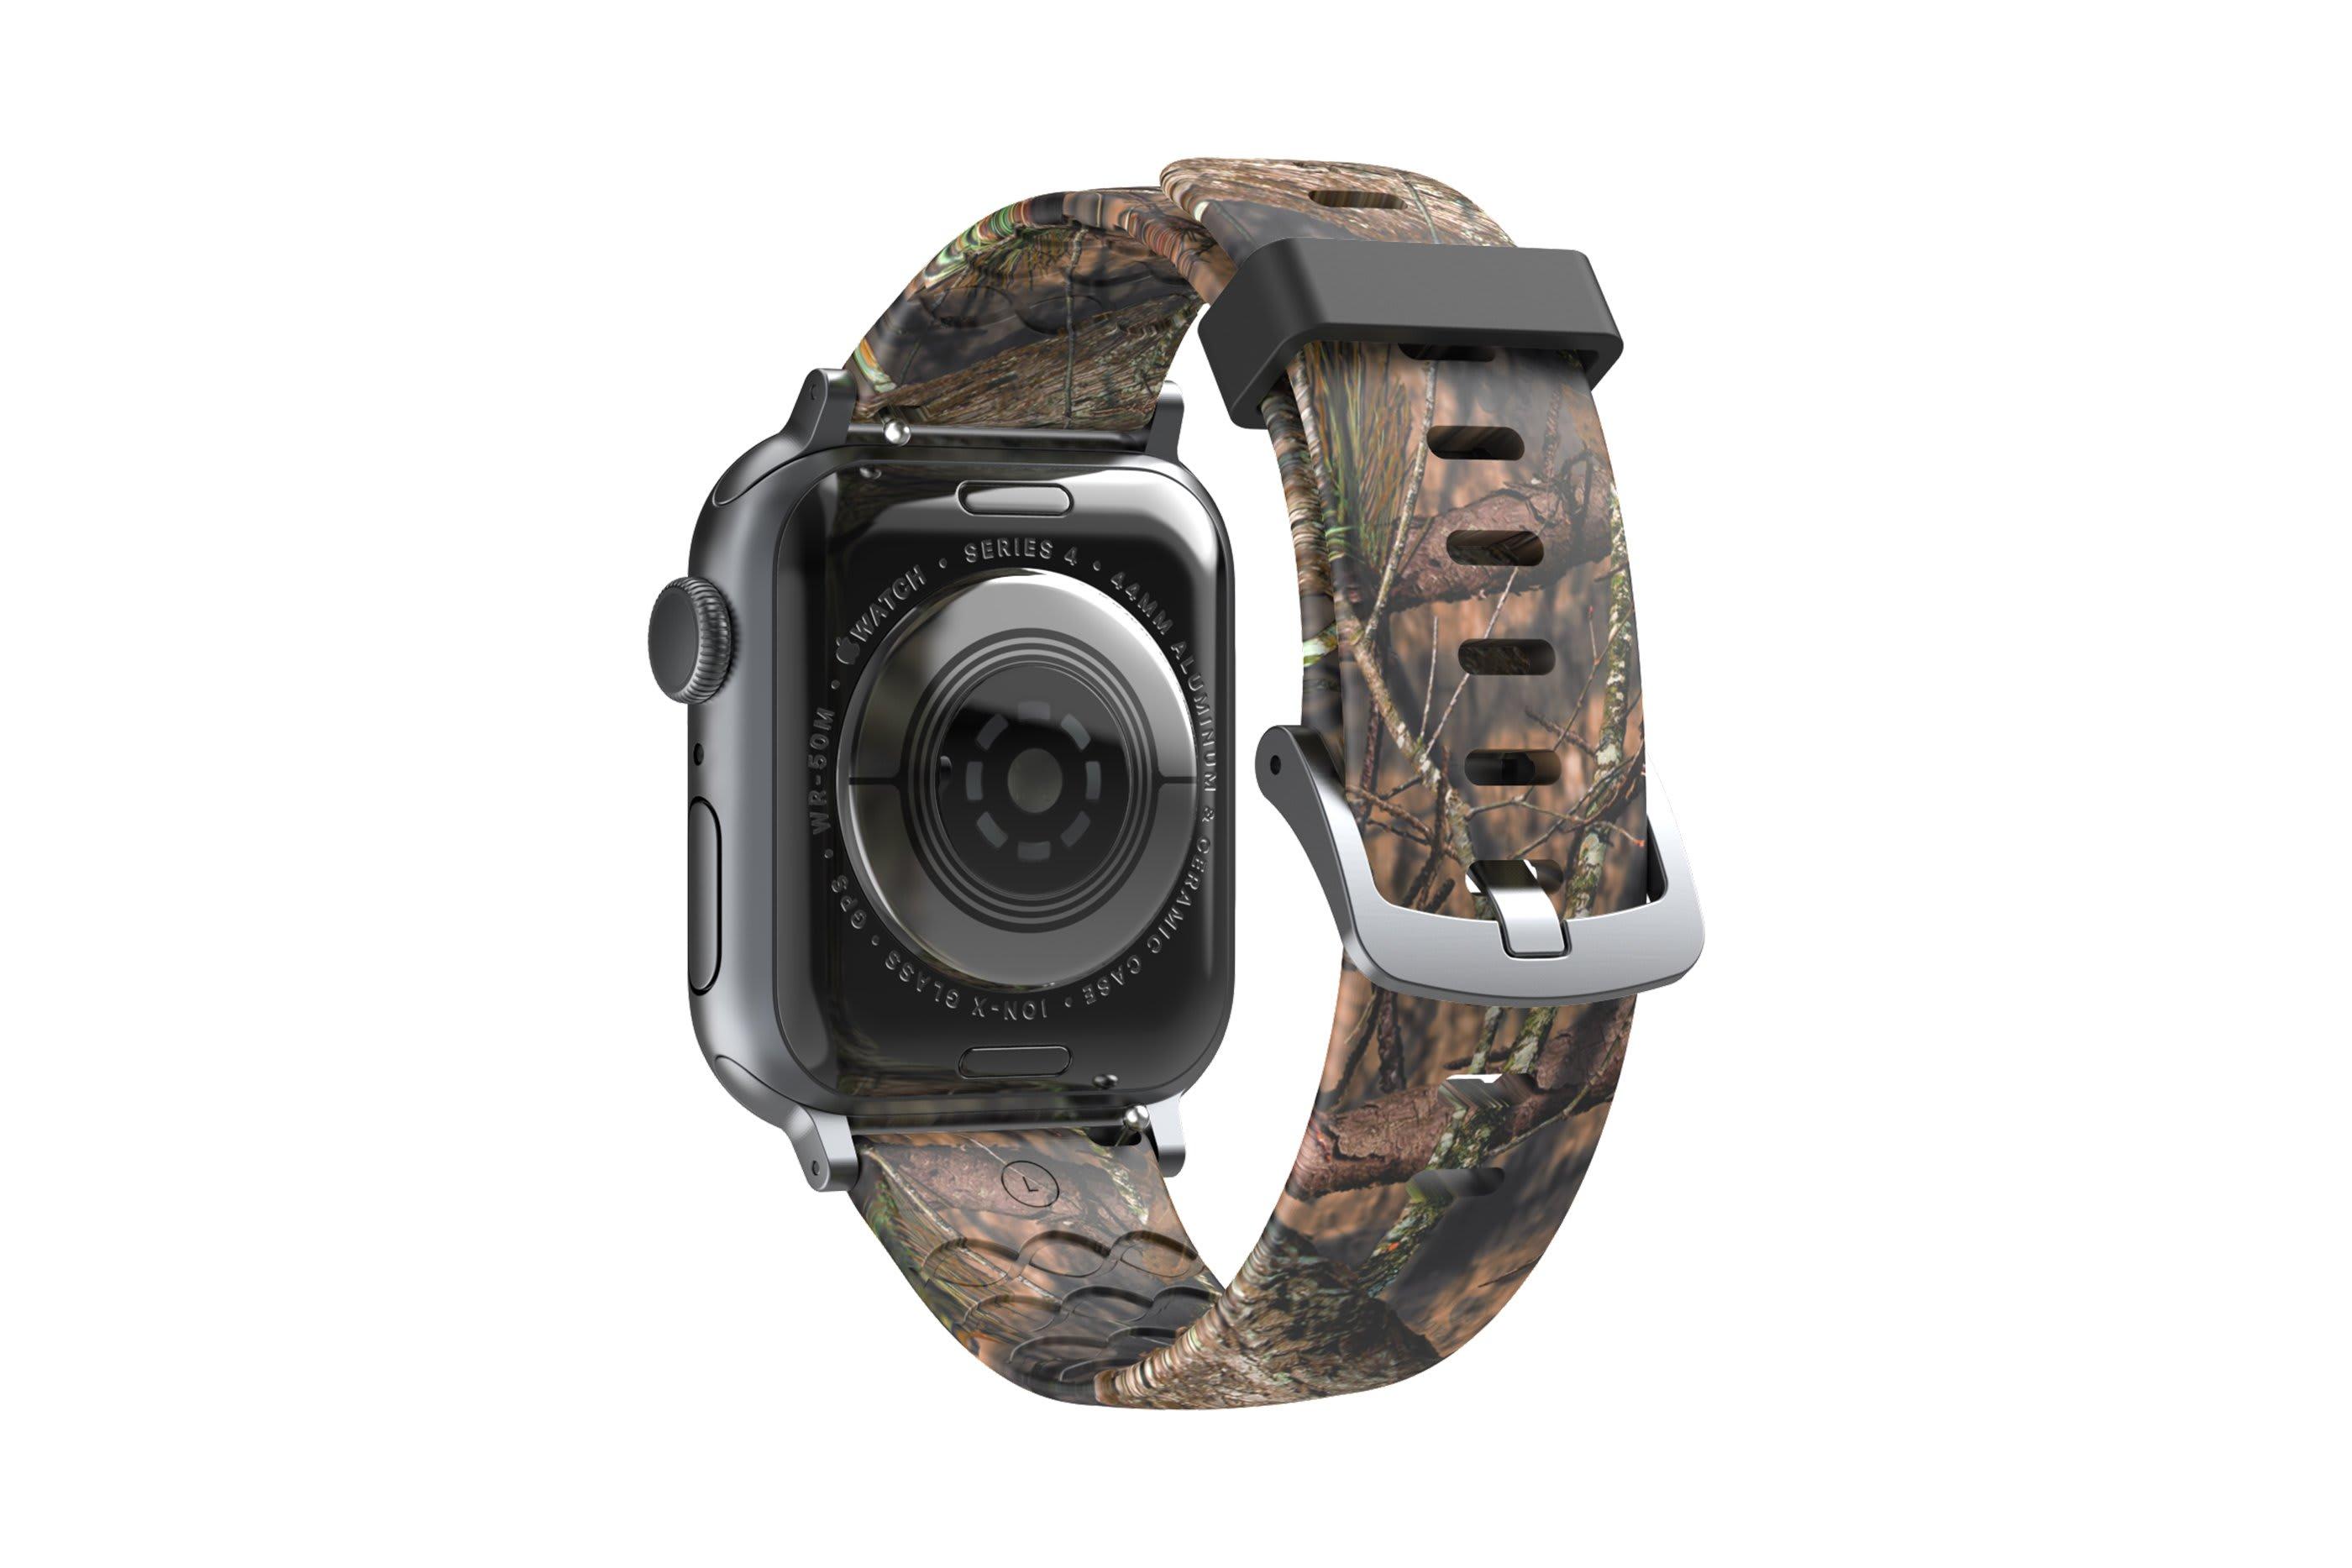 Mossy Oak Breakup Apple Watch Band with silver hardware viewed from rear